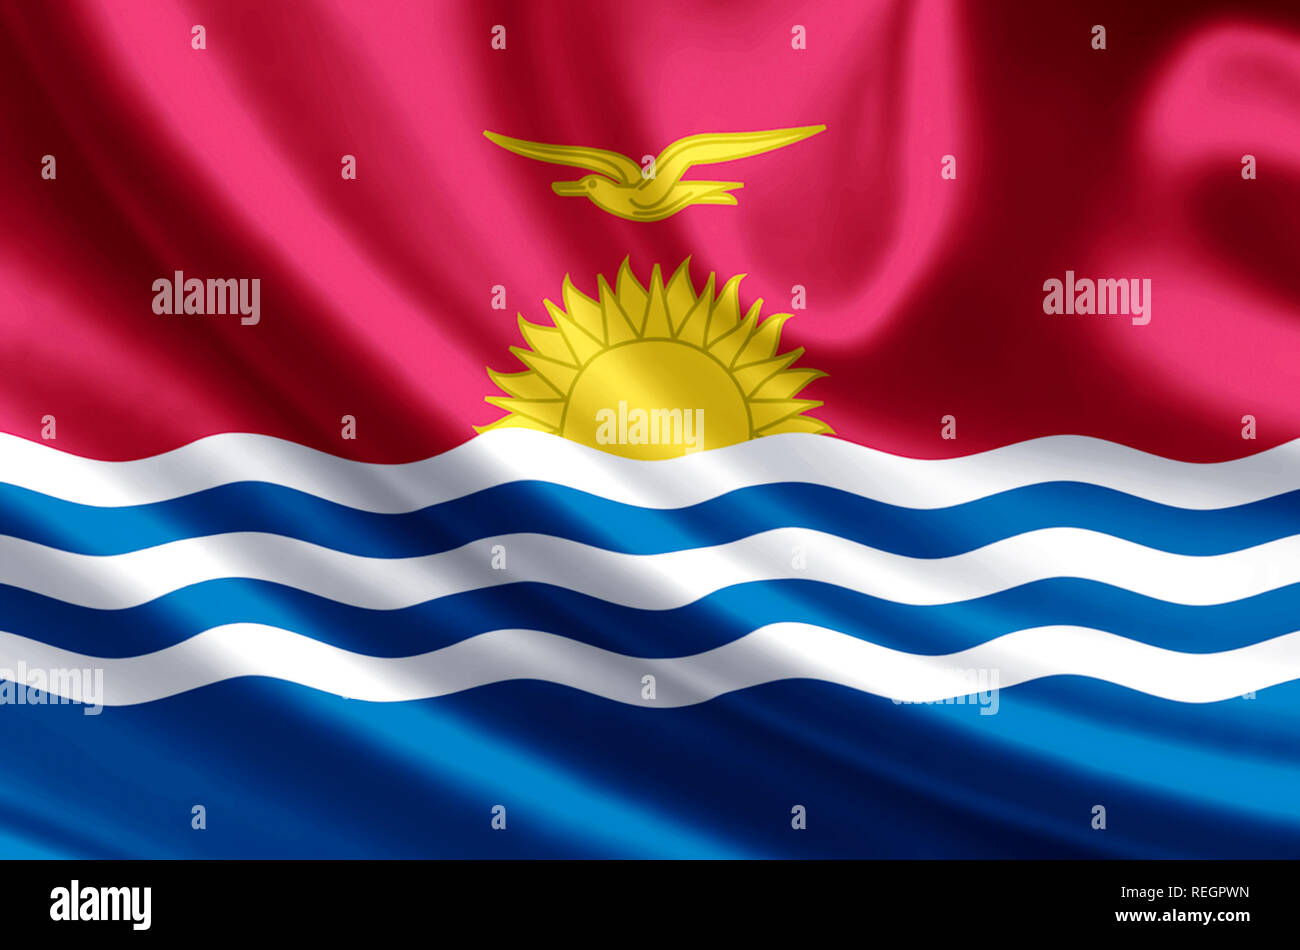 Kiribati waving and closeup flag illustration. Perfect for background or texture purposes. - Stock Image